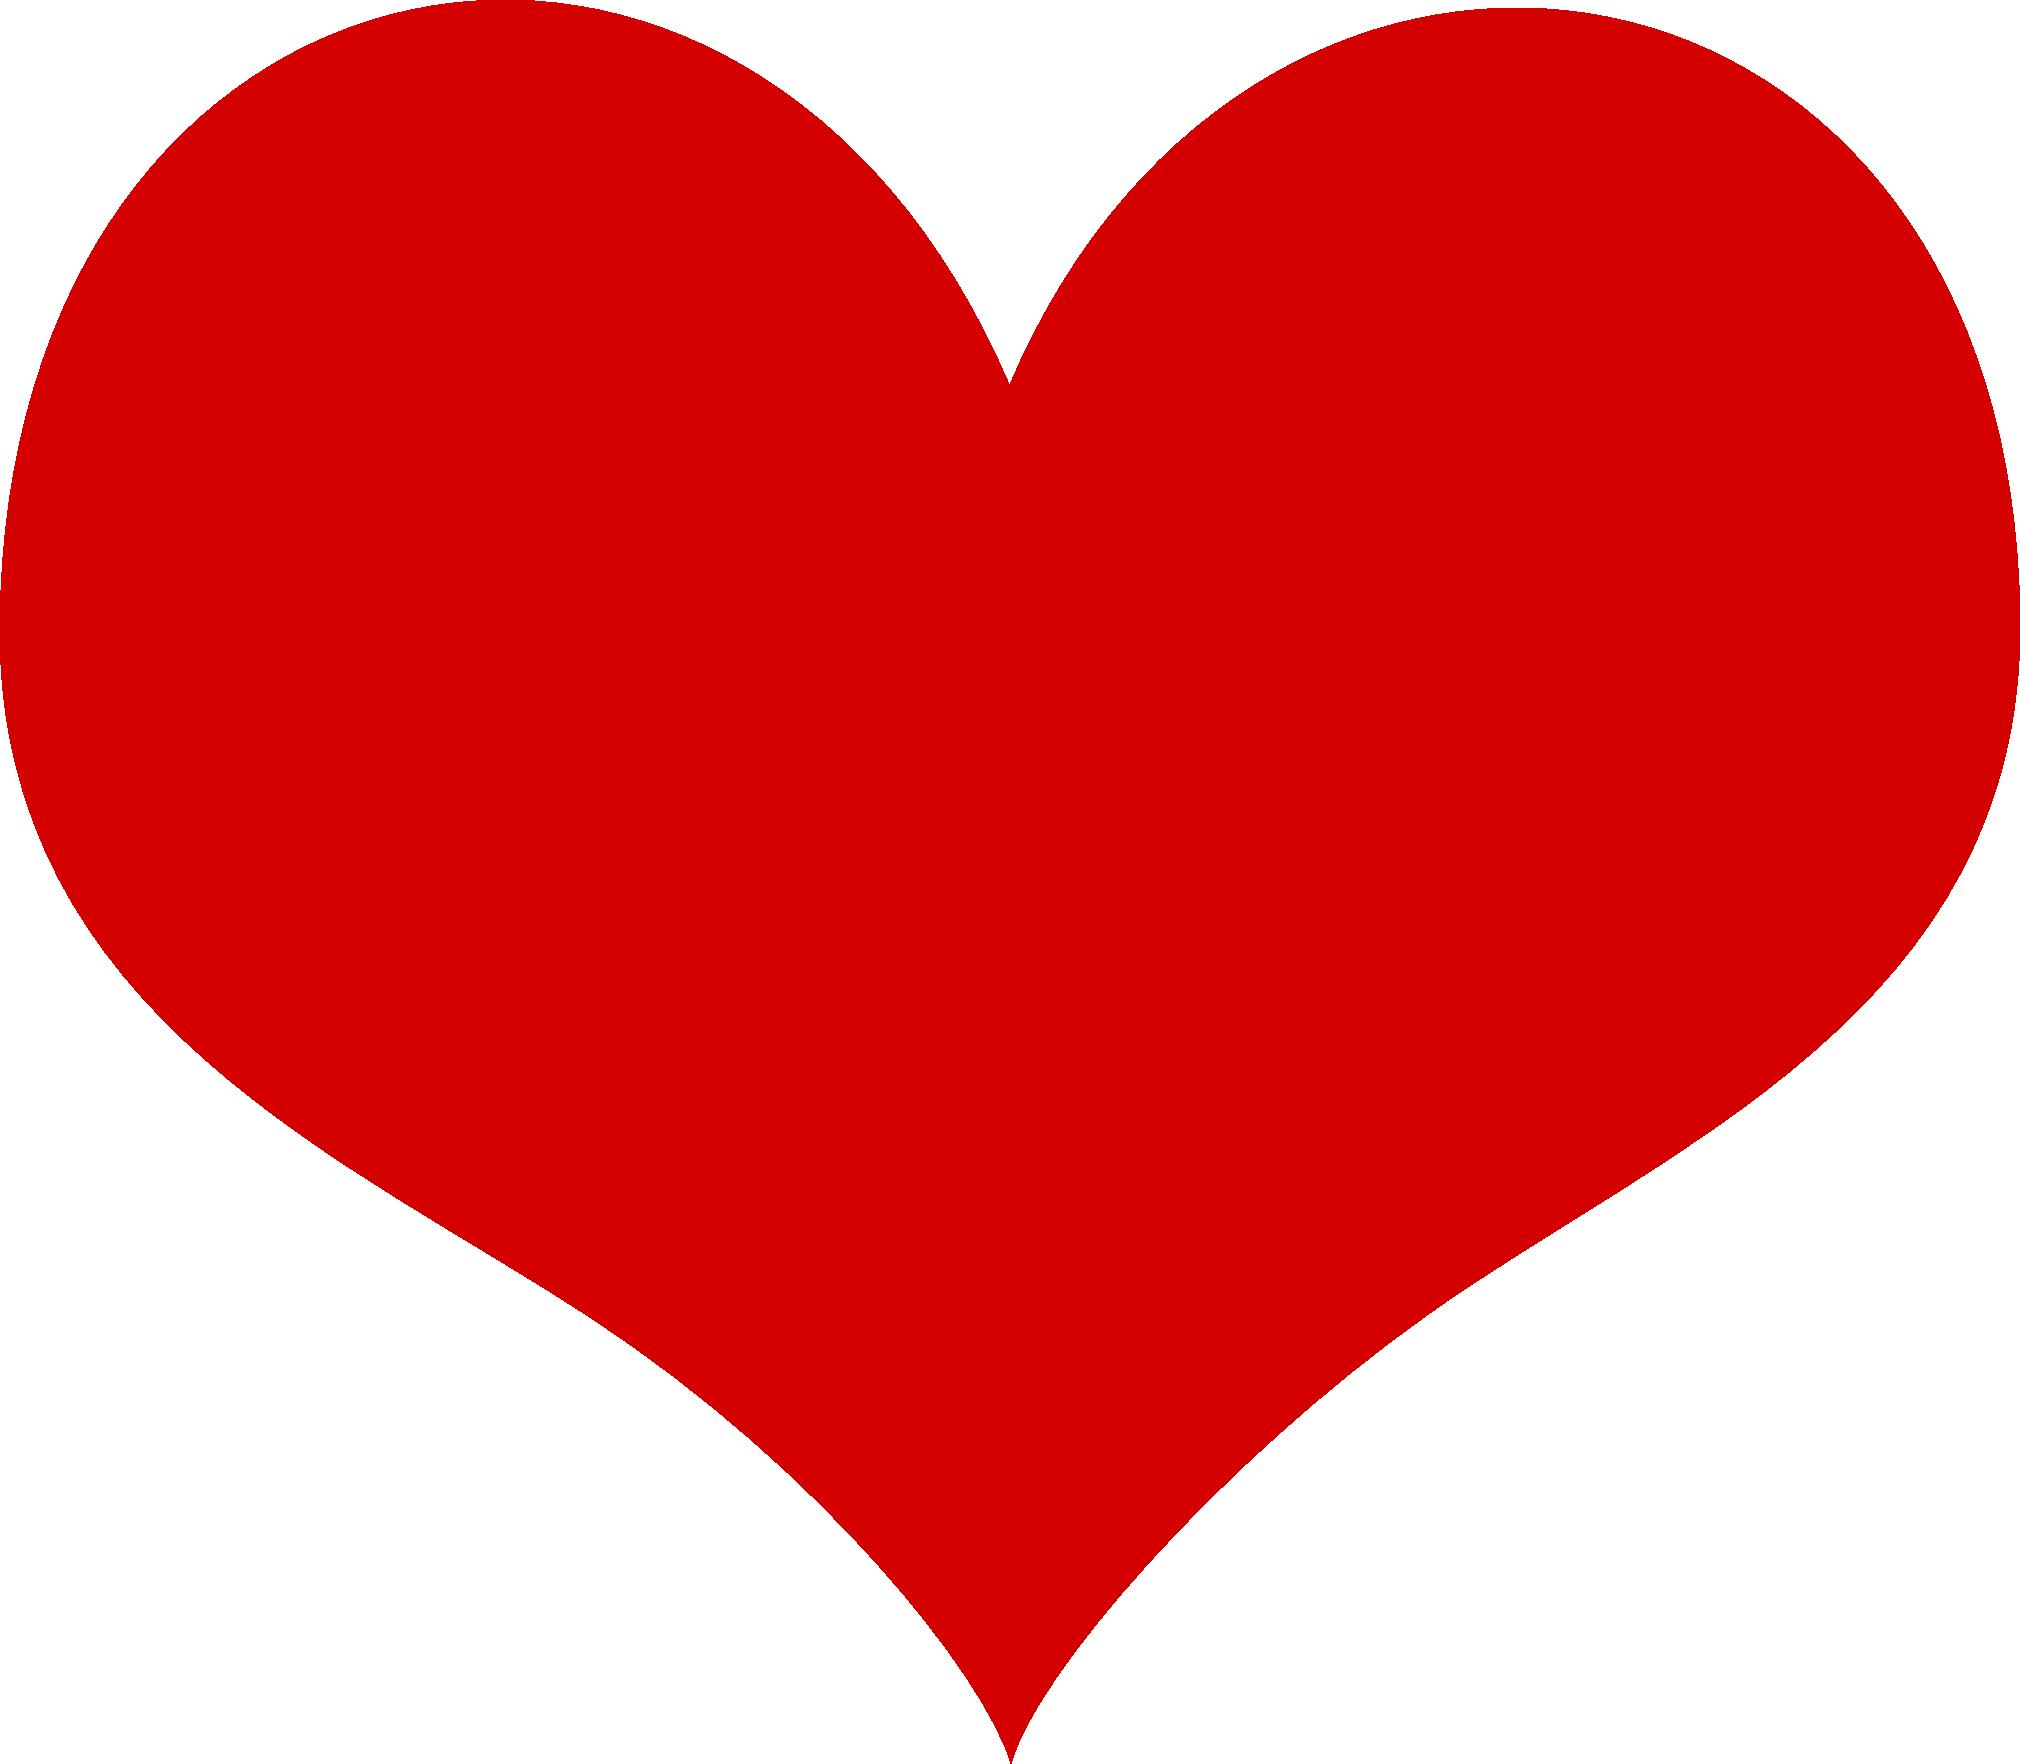 Clipart Valentine Heart Clipa - Valentine Heart Clipart